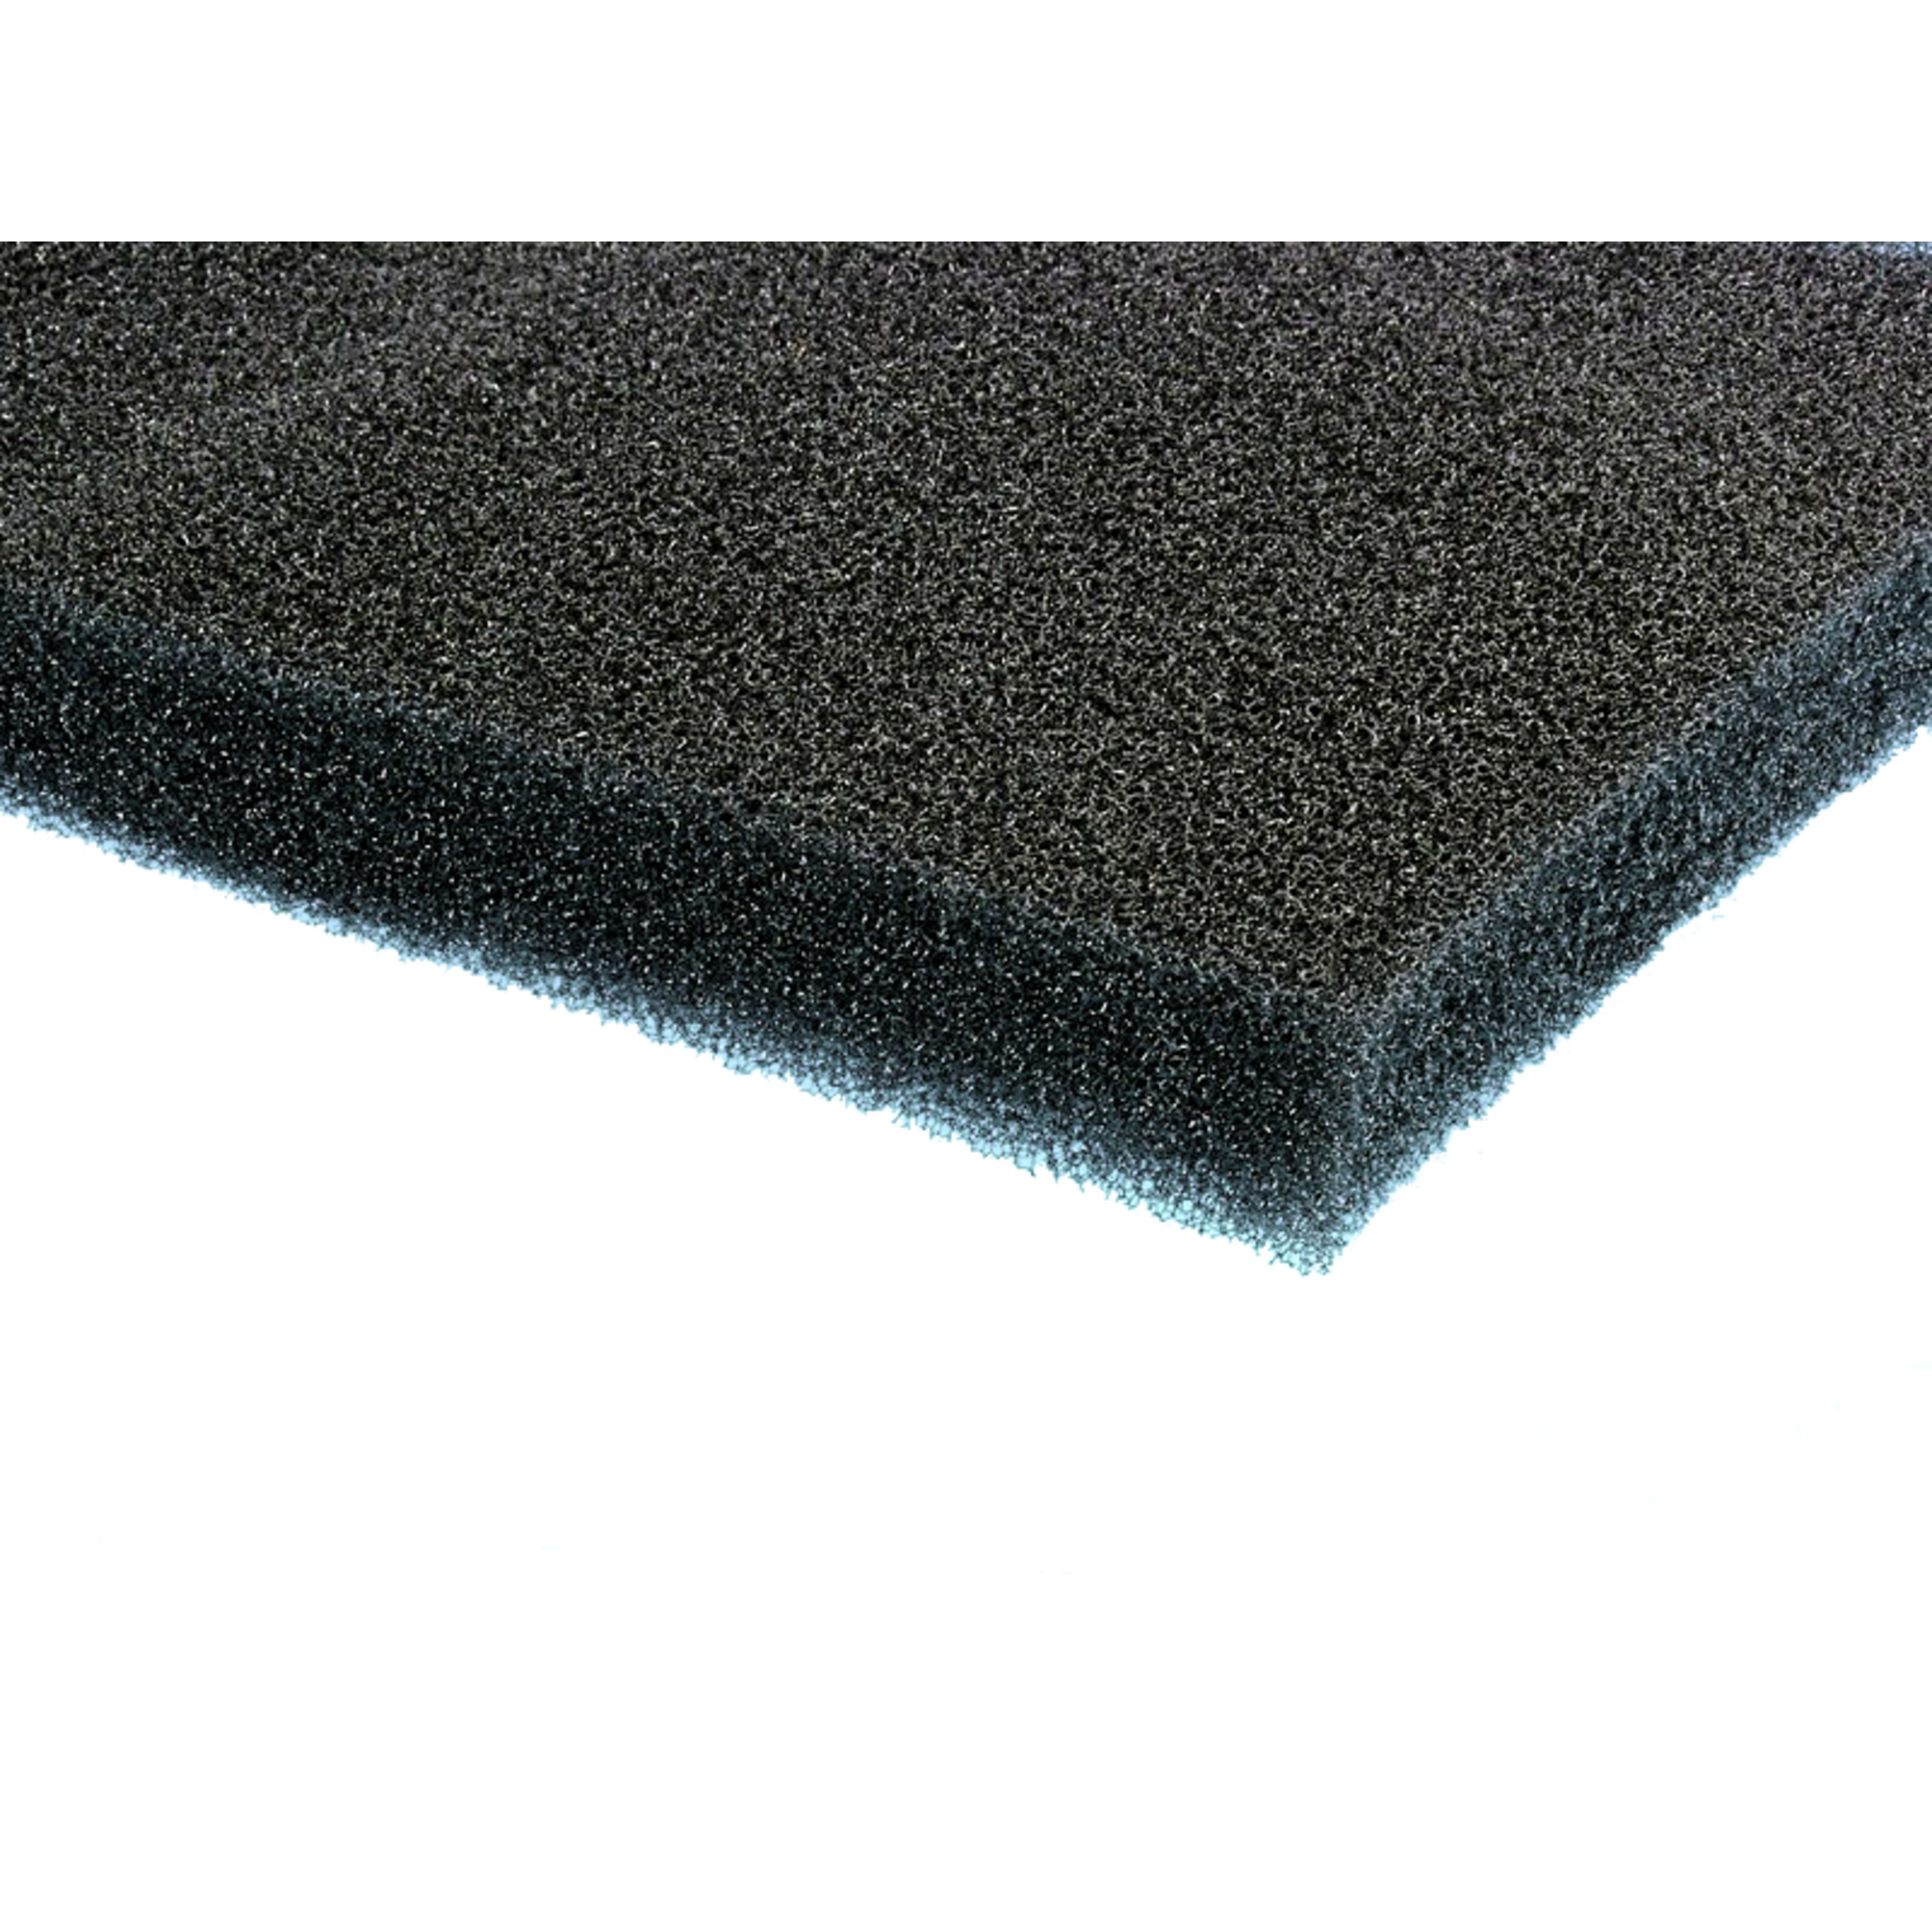 Adam Hall - Lautsprecher-Frontschaumstoff 200 x 100 cm, 5 mm 019505